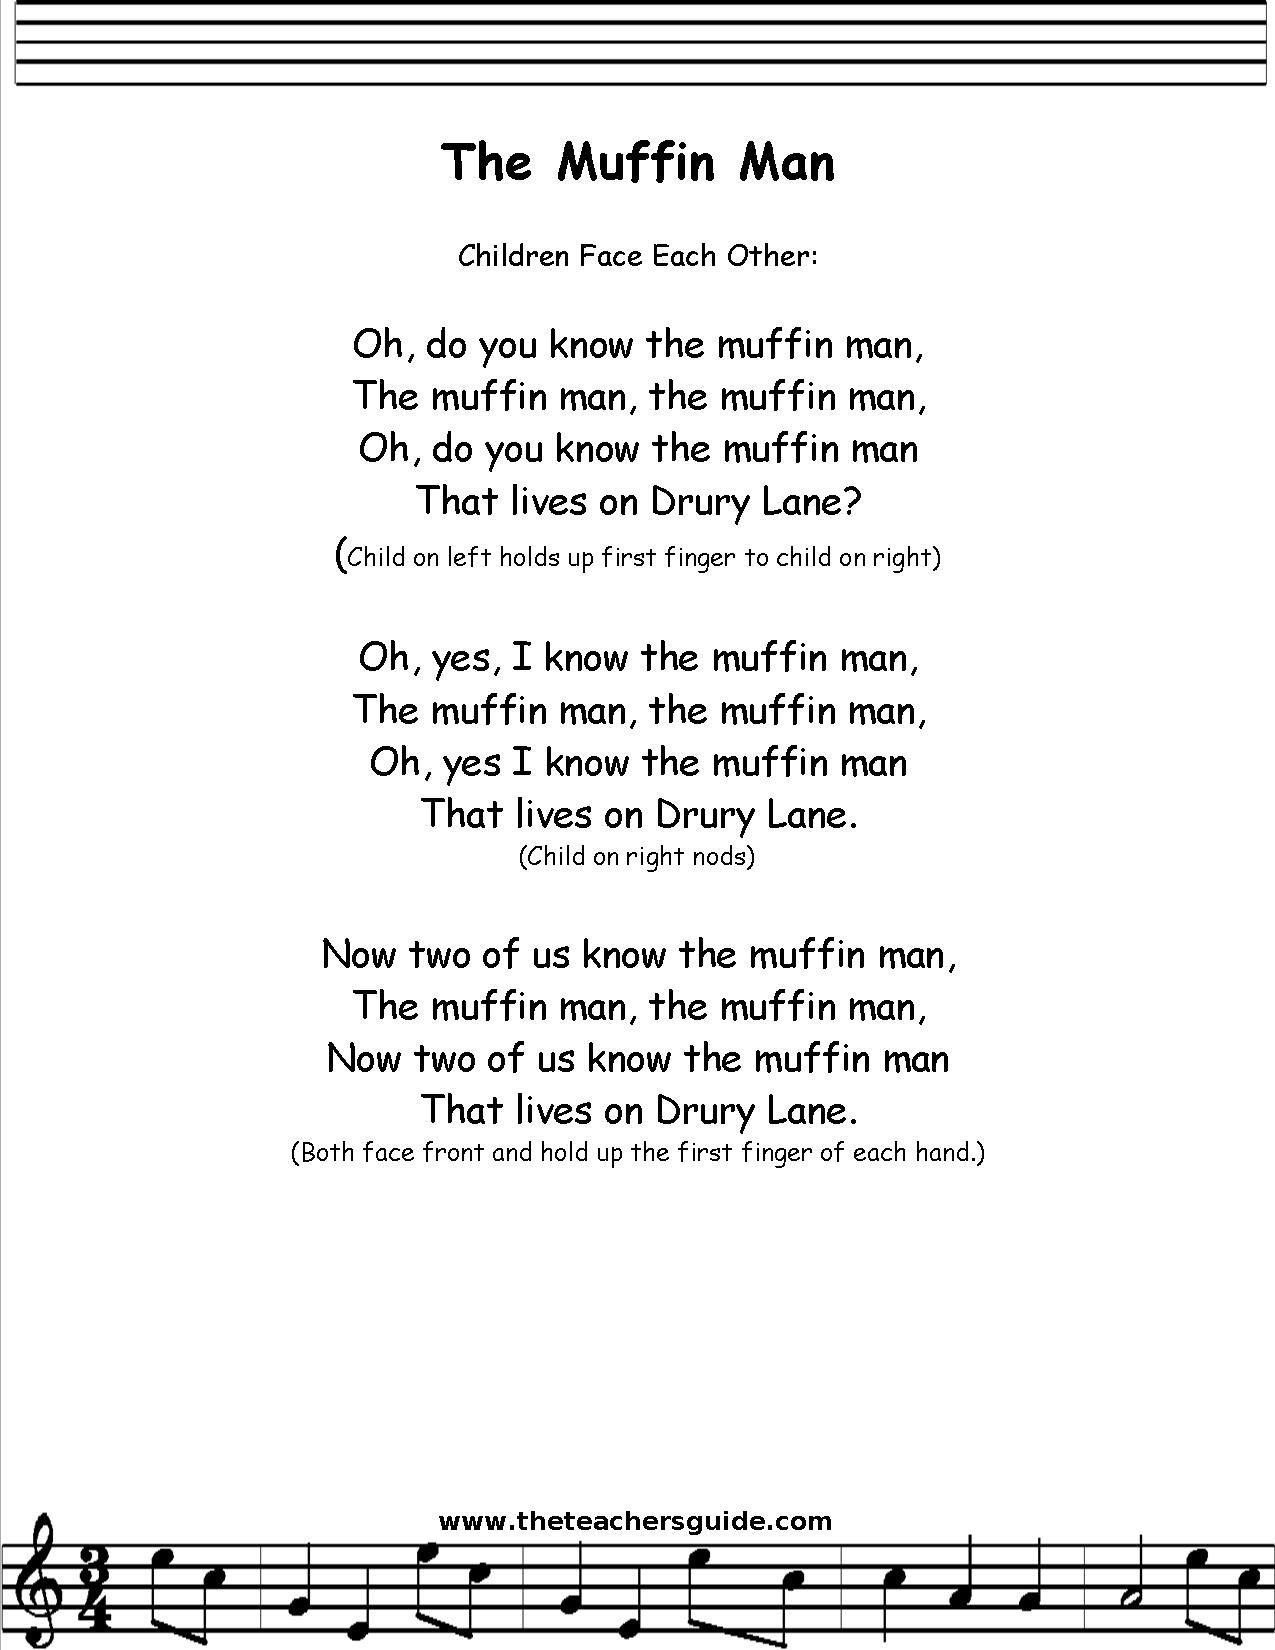 Muffin Man Lyrics Printout